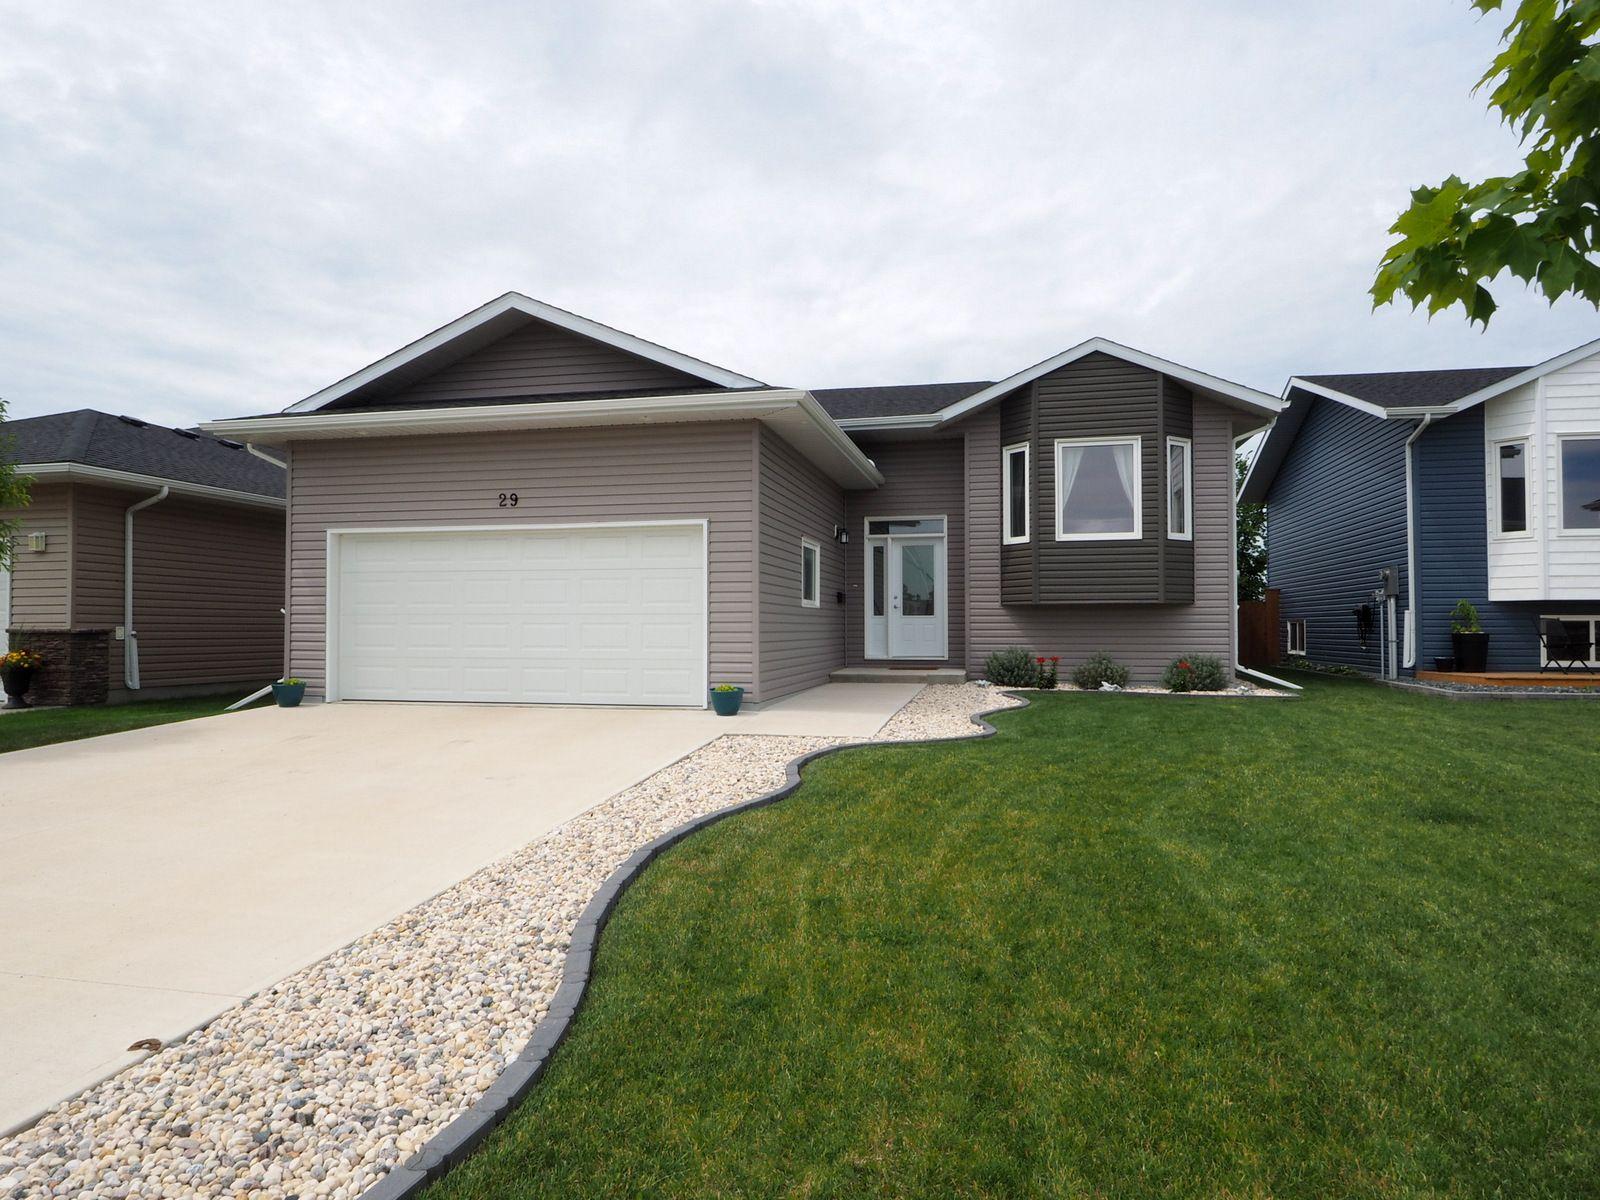 Main Photo: 29 Kelly K Street in Portage la Prairie: House for sale : MLS®# 202017280